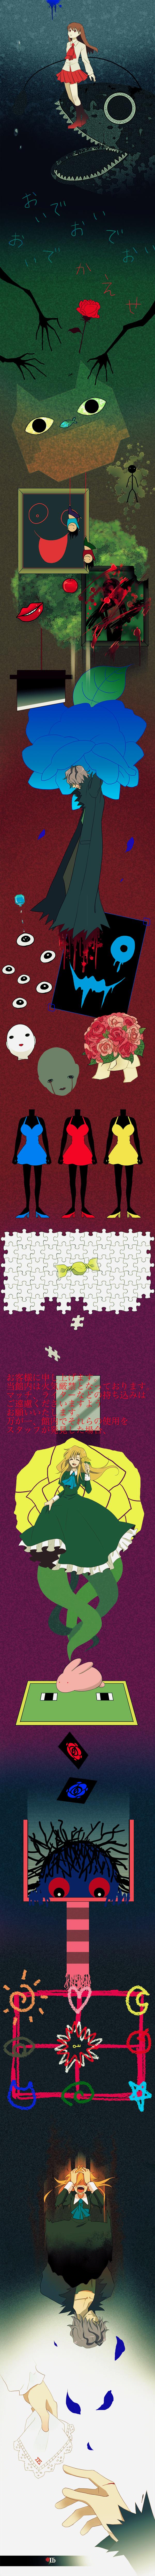 Tags: Anime, Pixiv Id 4338498, Ib, Mary (Ib), Ib (Character), Garry, Death of the Individual, Painting (Object), Blood Tears, Eyeball, Head, Desperate, Handkerchief